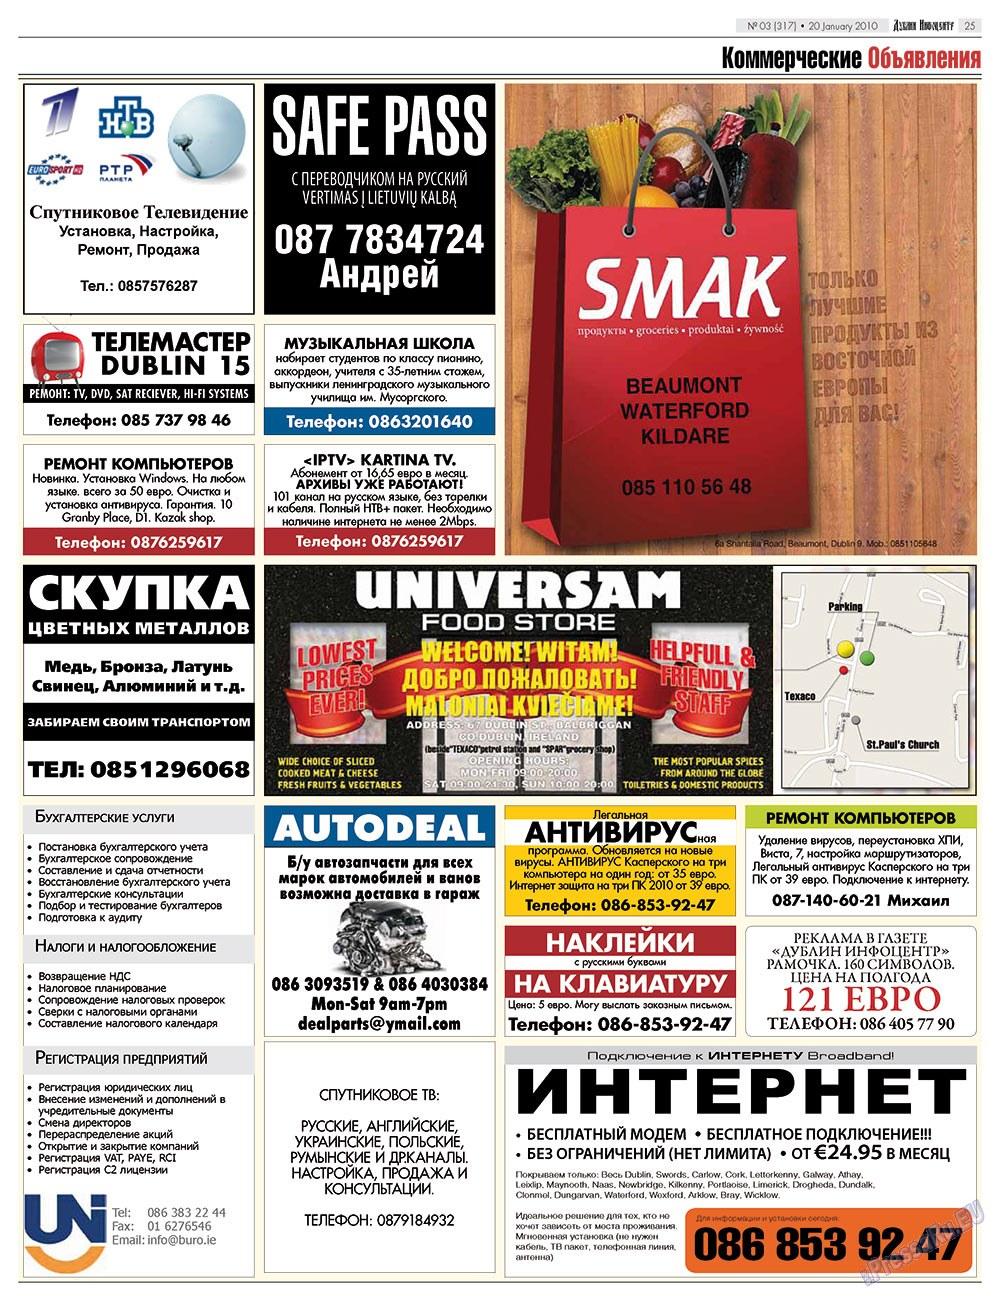 Дублин инфоцентр (газета). 2010 год, номер 3, стр. 25